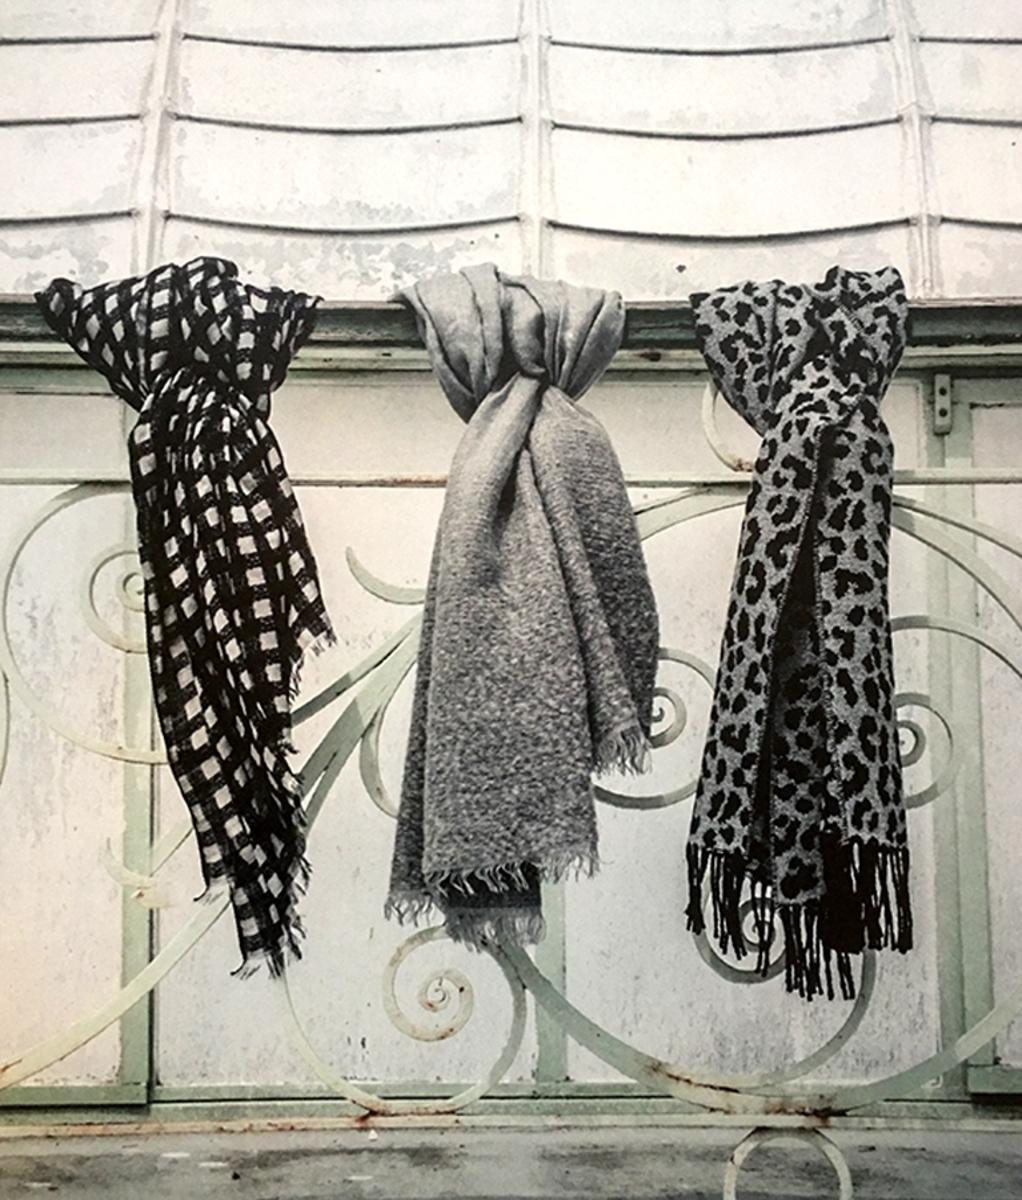 Ploumanac'h - 457 Photos - 11 Reviews - Clothing (Brand)